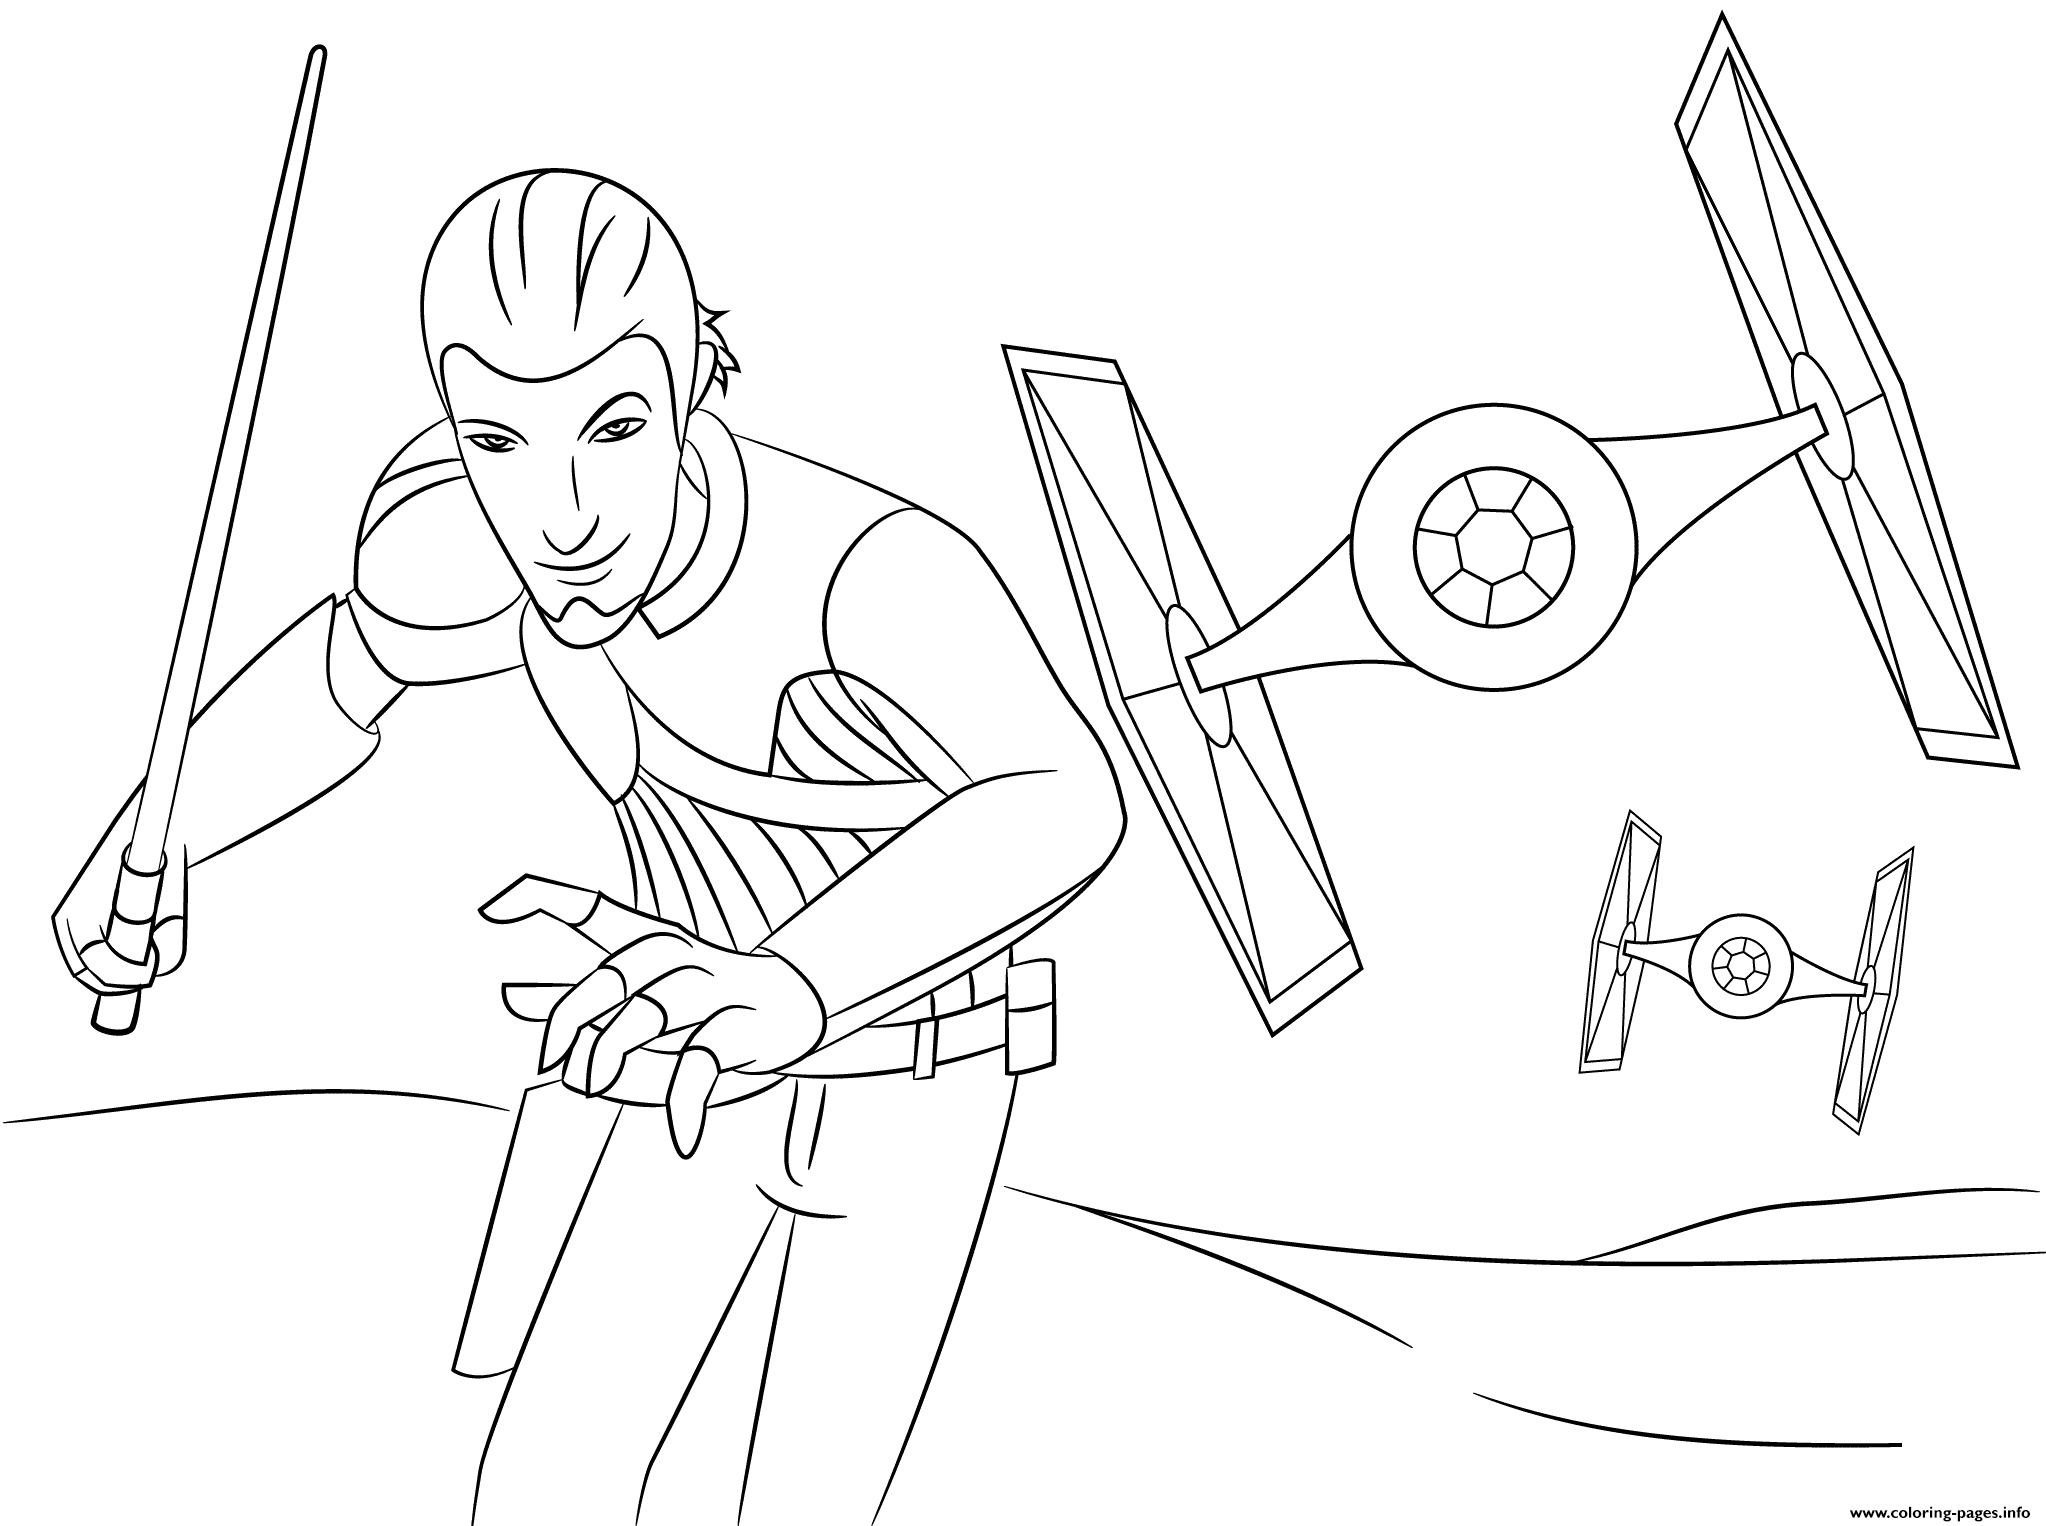 Star Wars Rebels Kanans Coloring Pages Printable